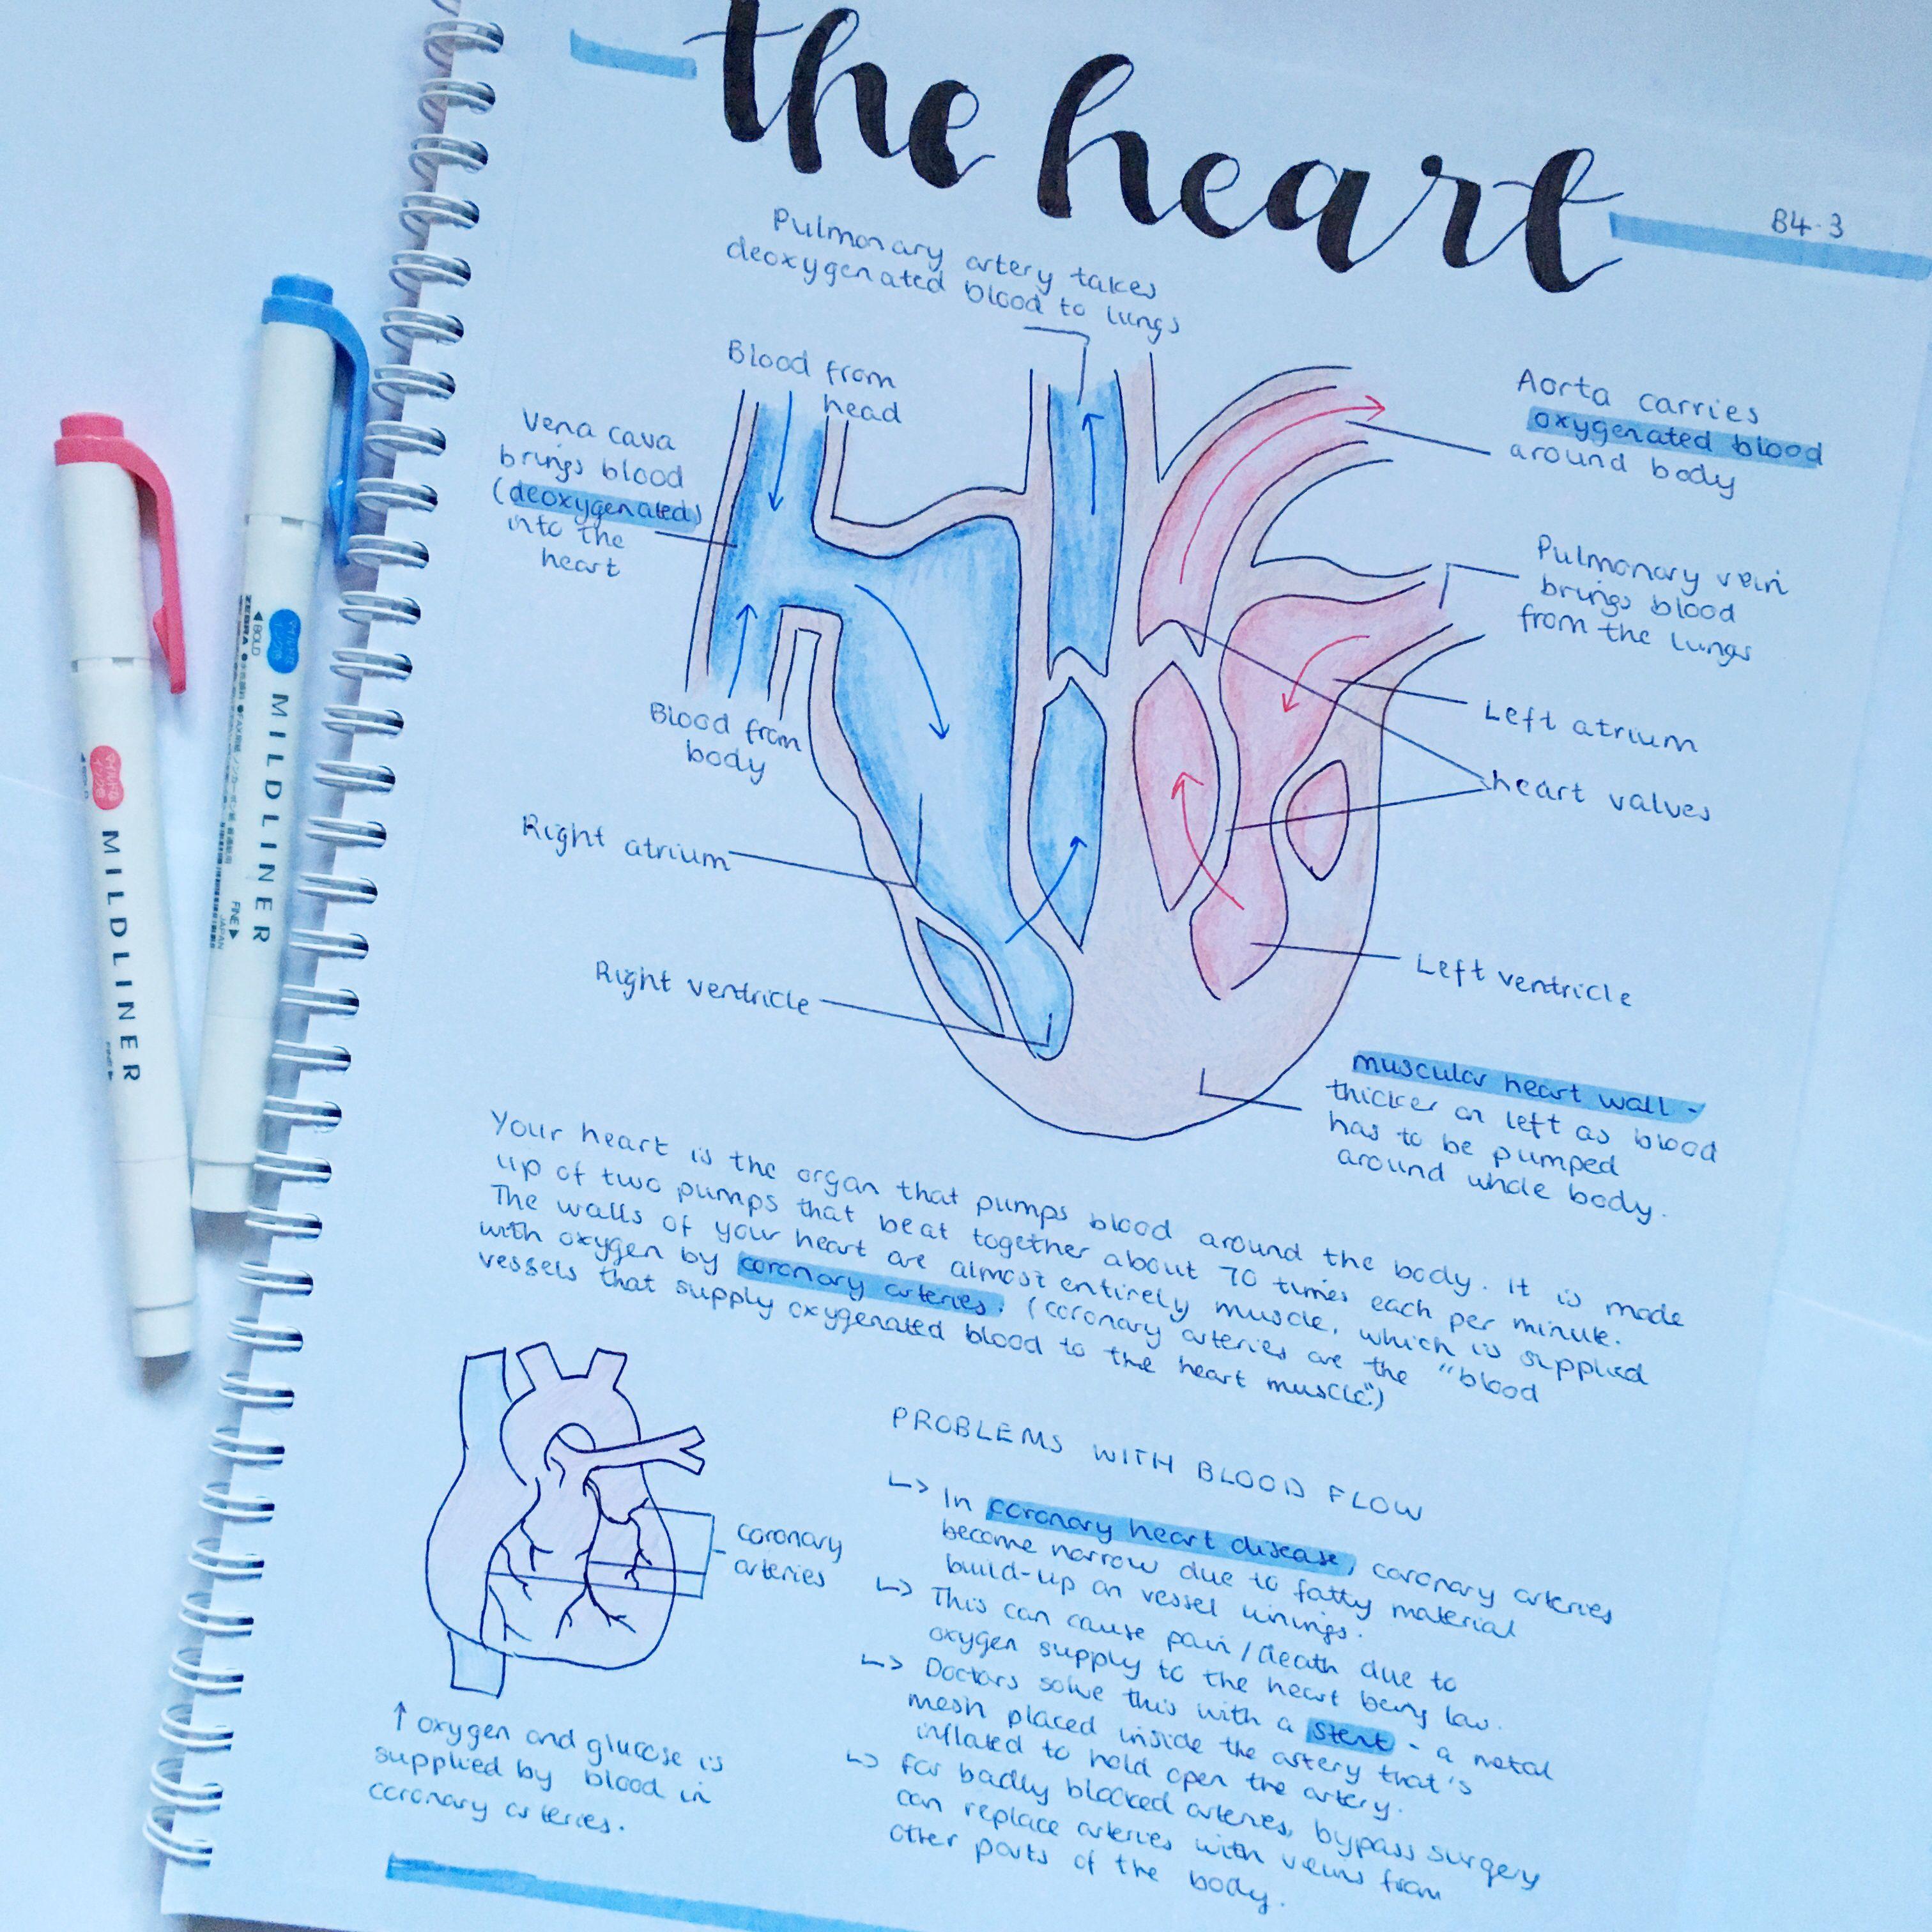 biology b4 aqa gcse combined science summary on the heart ...